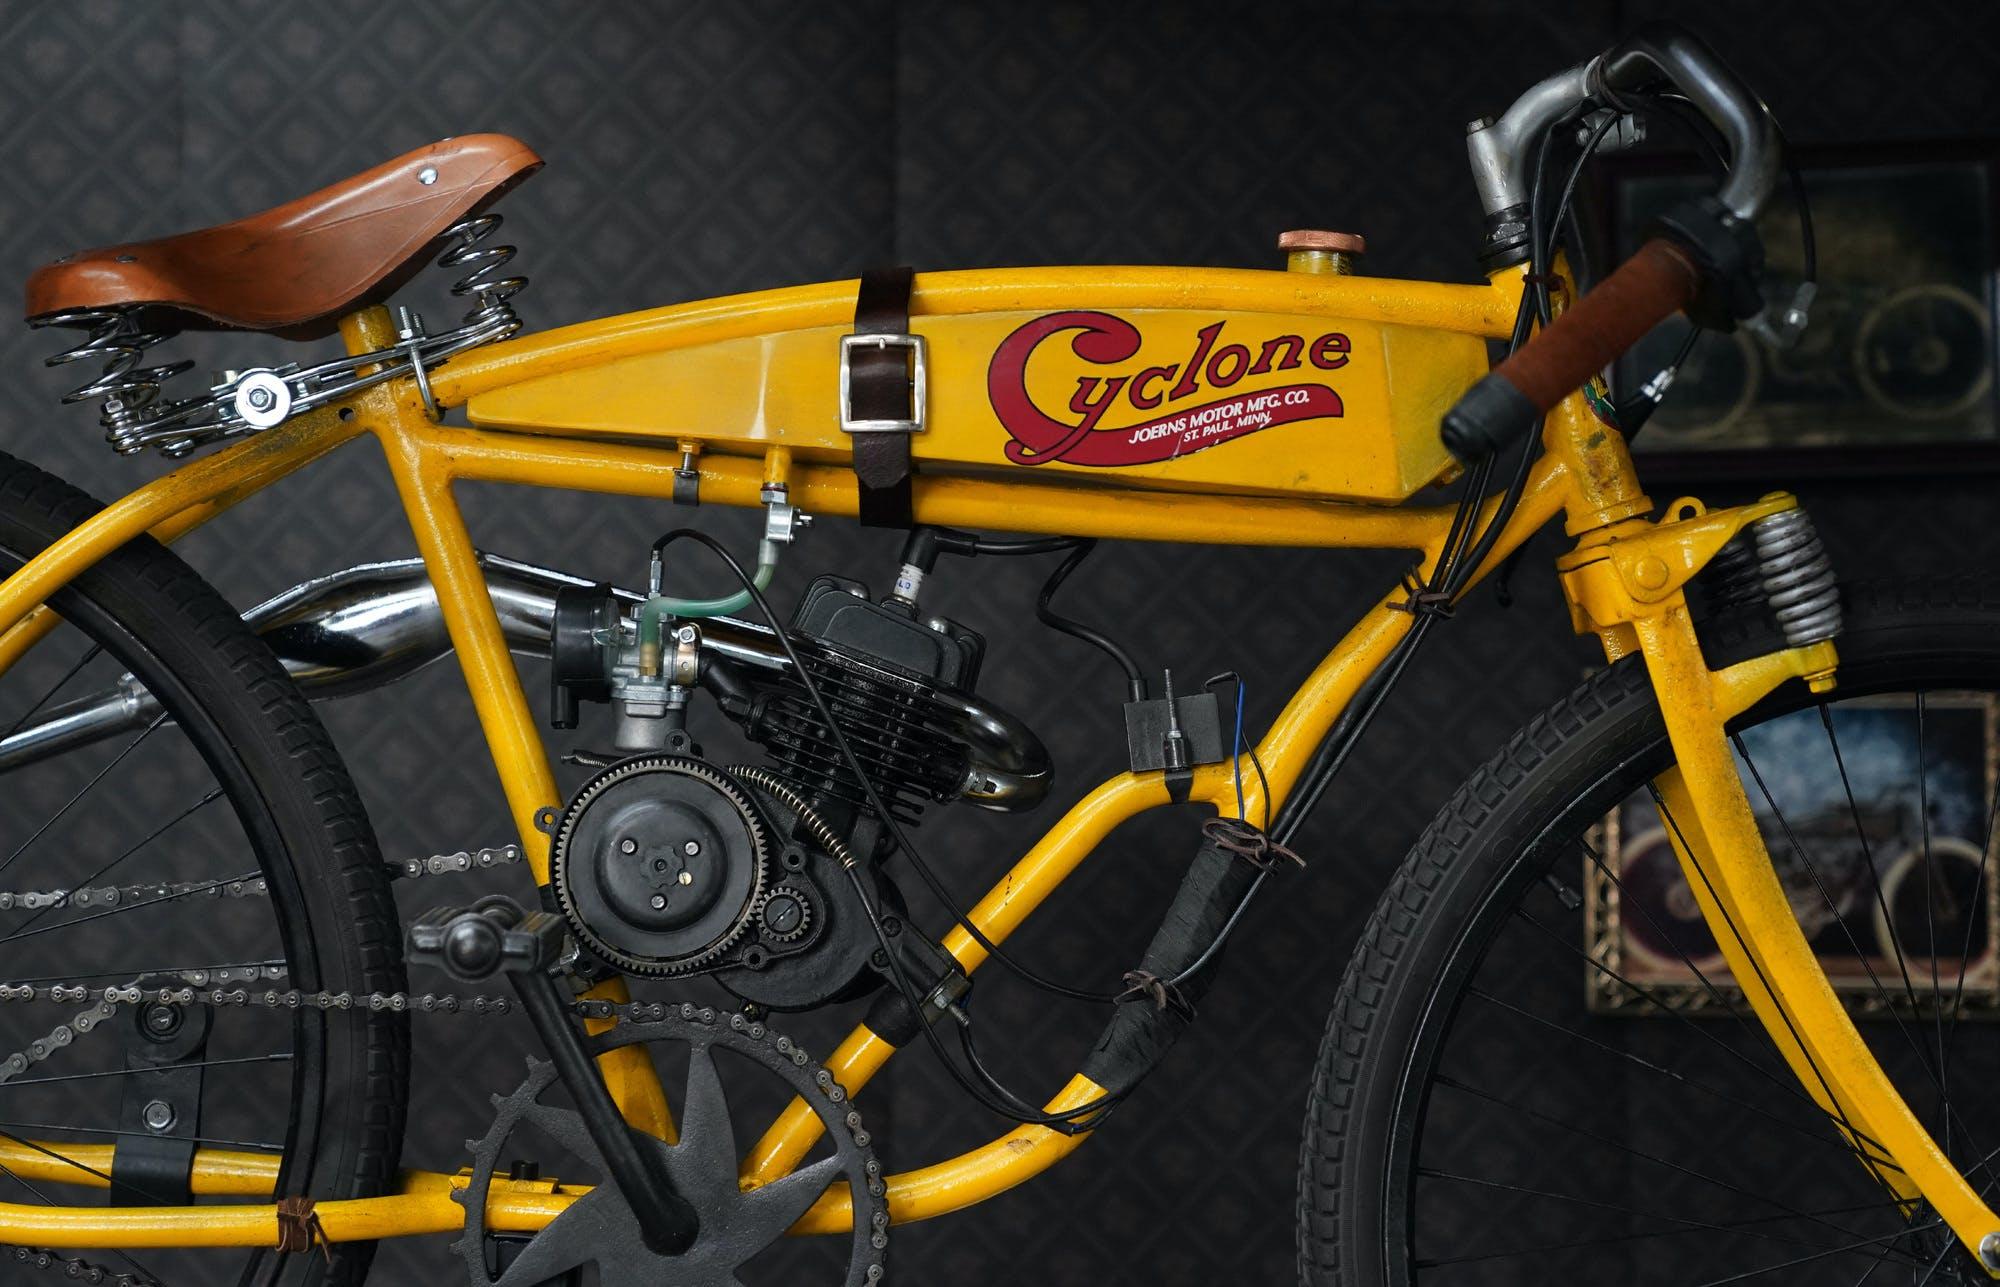 Detail of the Cyclone tribute bike.